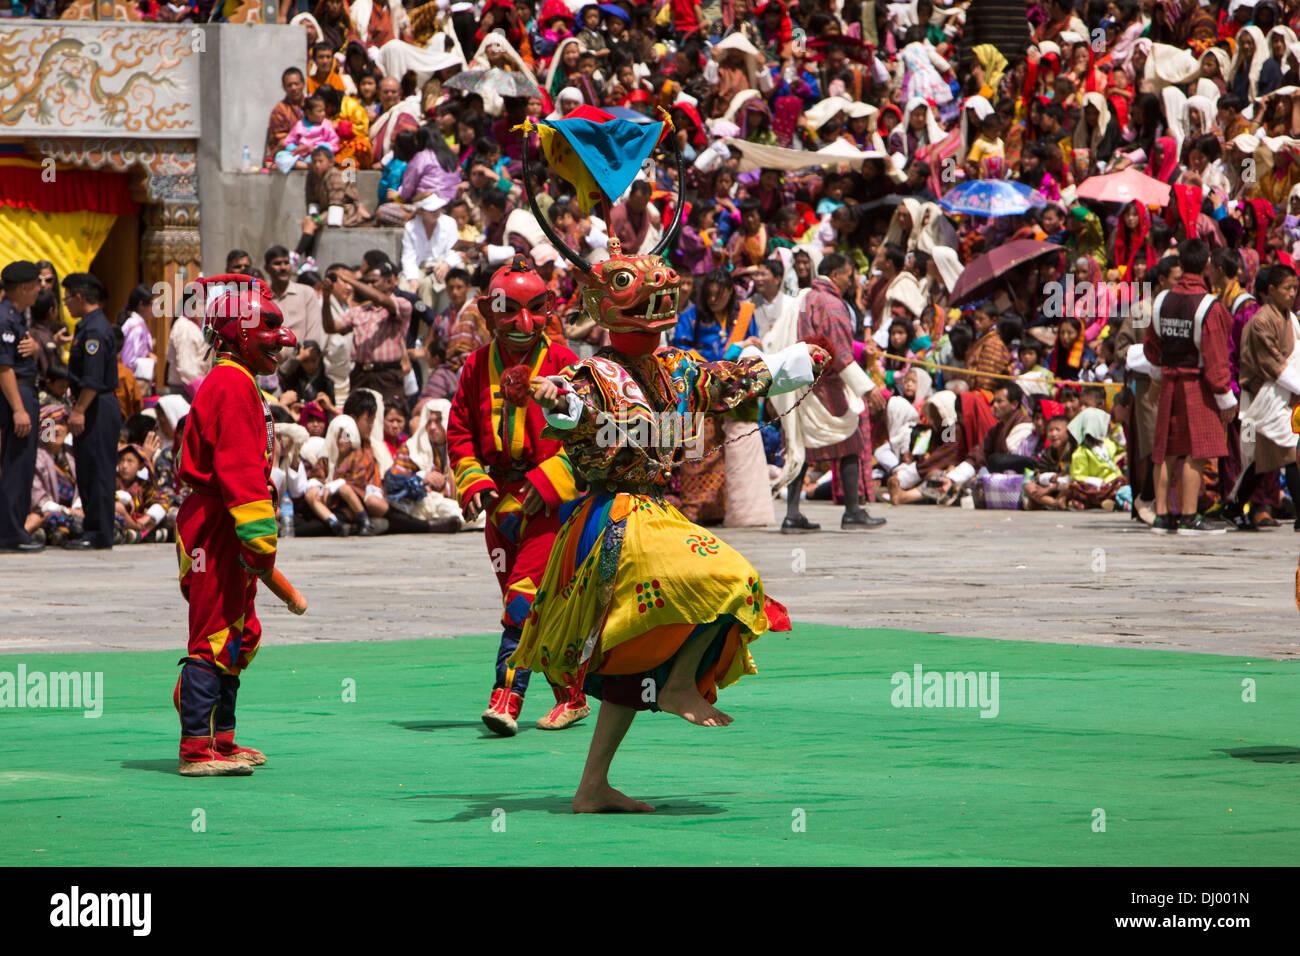 Le Bhoutan, Thimphu Dzong, Tsechu annuel, la danse du cerf et le chou (Shawo Shachi) Photo Stock